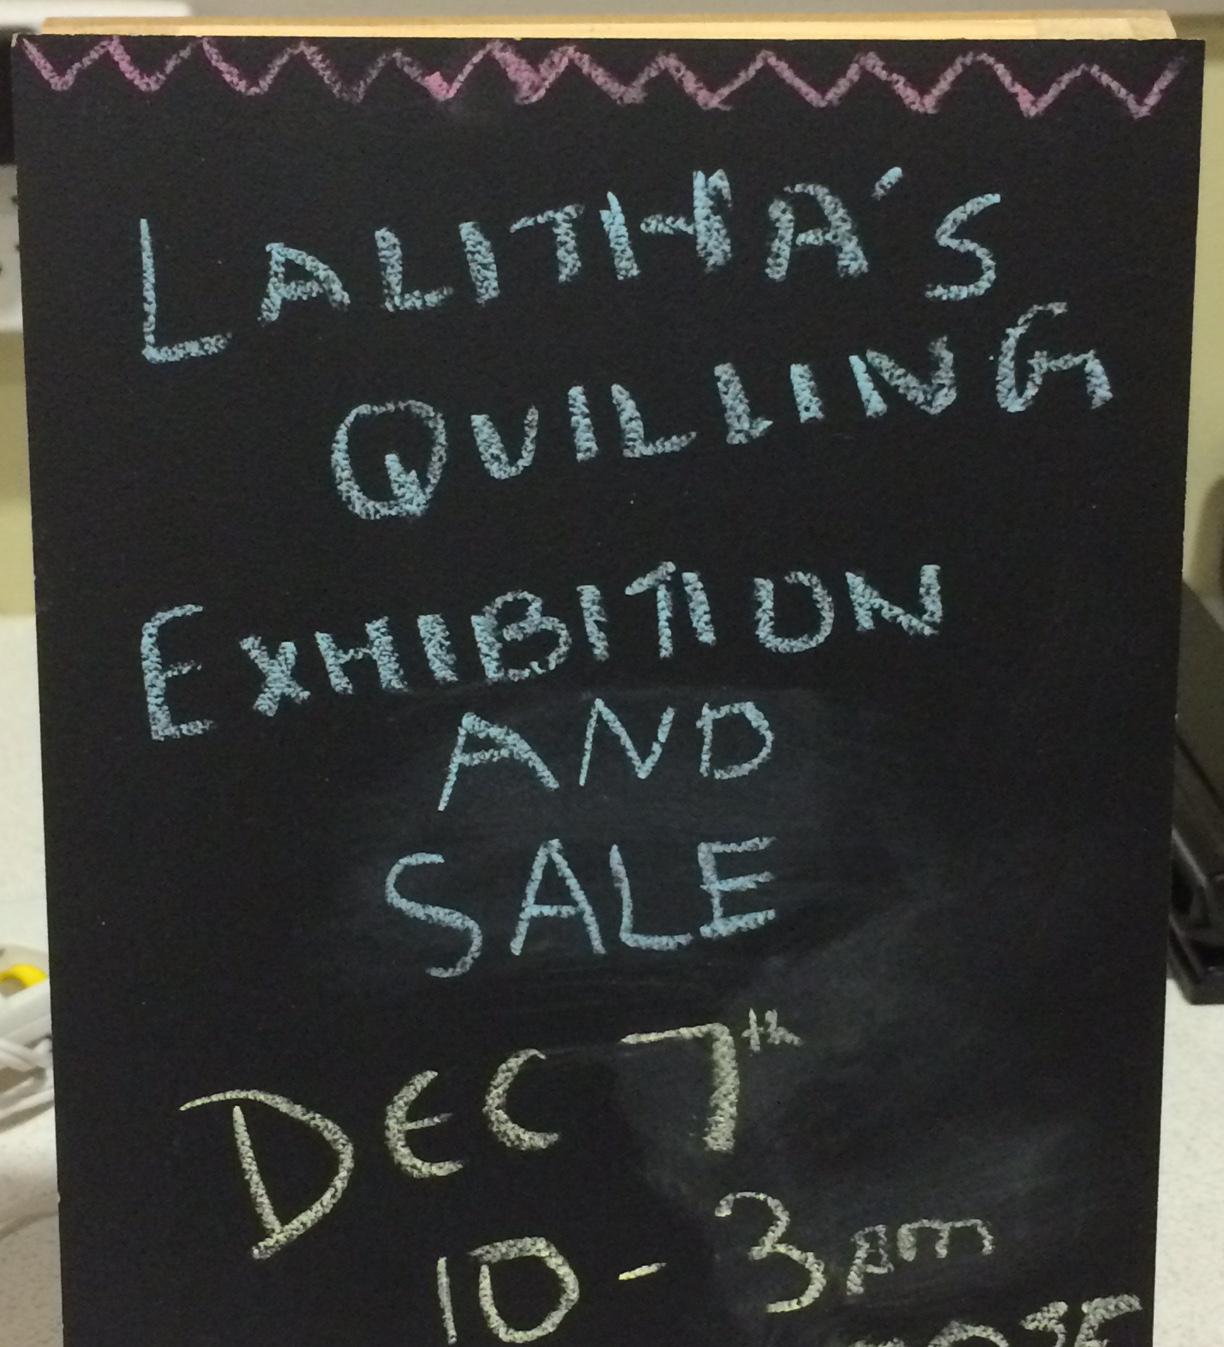 Exhibition Prep 2